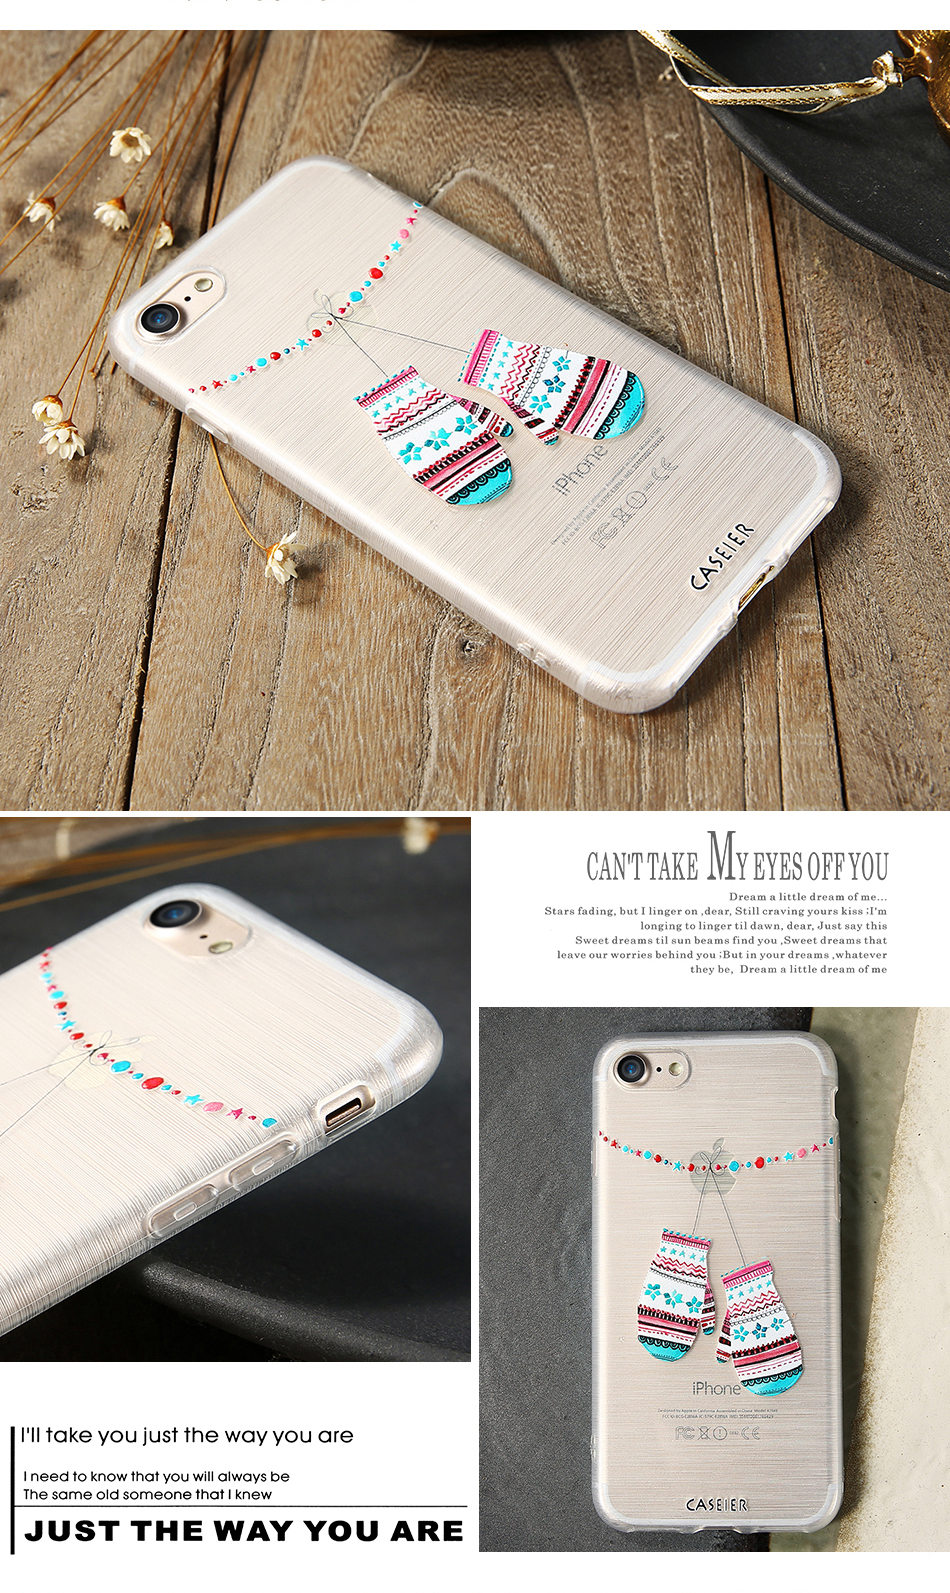 HTB18SIpOpXXXXbbXXXXq6xXFXXXz - Christmas Phone Case For iPhone 7 6 6S Plus iPhone 5S SE 5 Cases For Samsung Galaxy S6 S7 Edge Cute Cover Accessories PTC 286